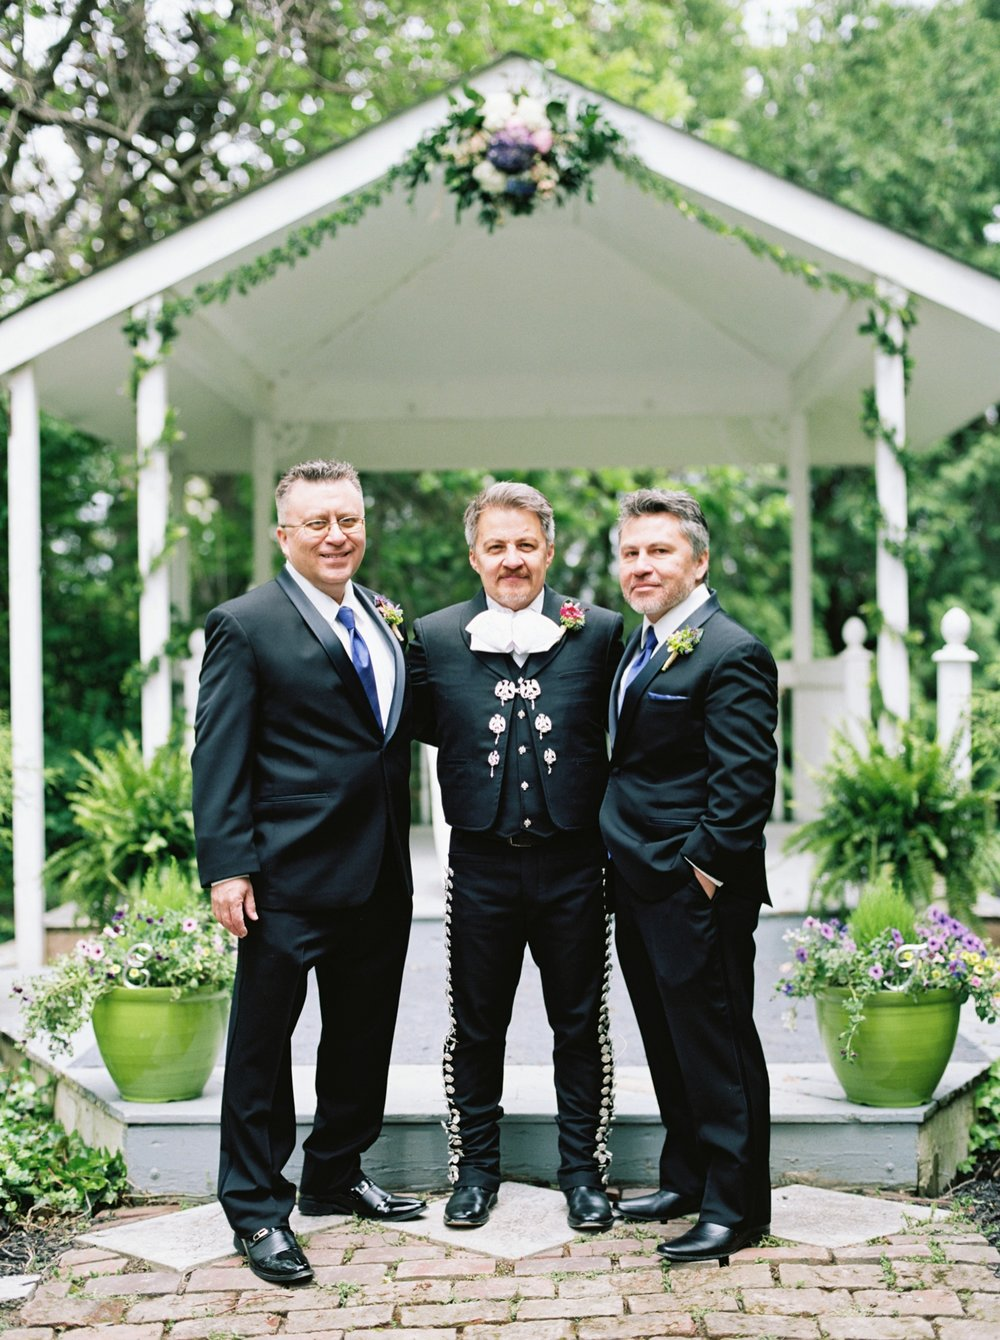 season magnolia manor wedding elisa ignacio czar goss photo 19.jpg